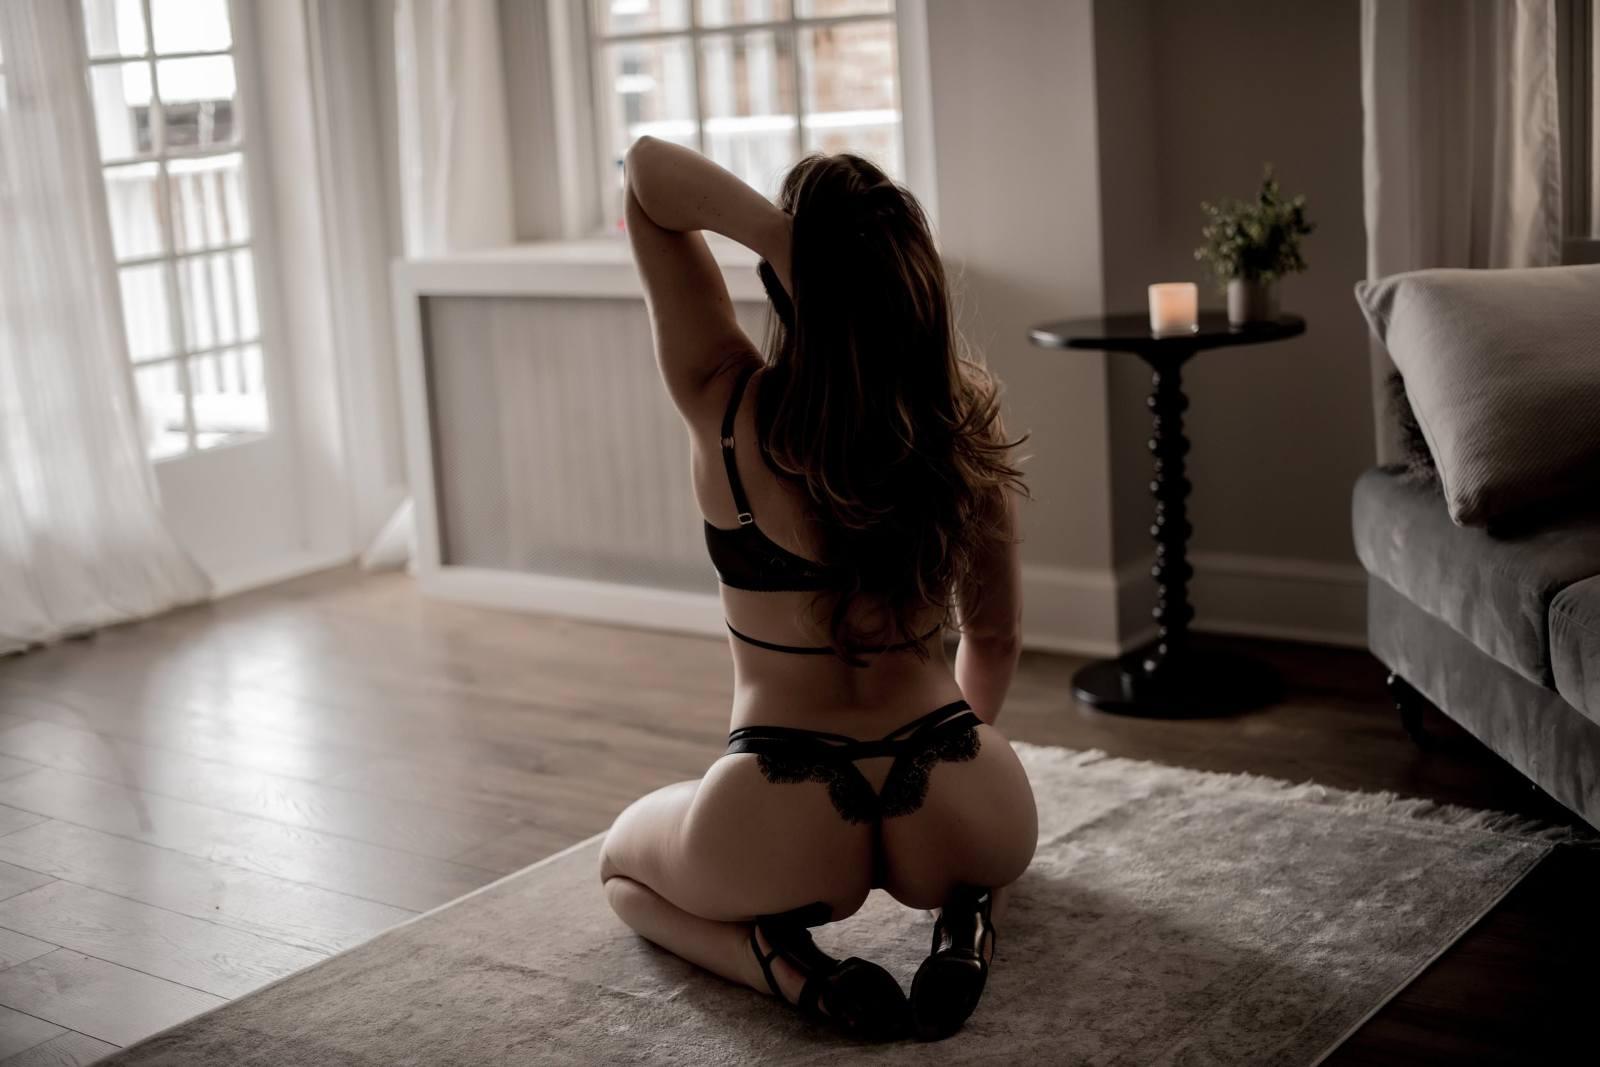 sexy, moody boudoir photoshoot